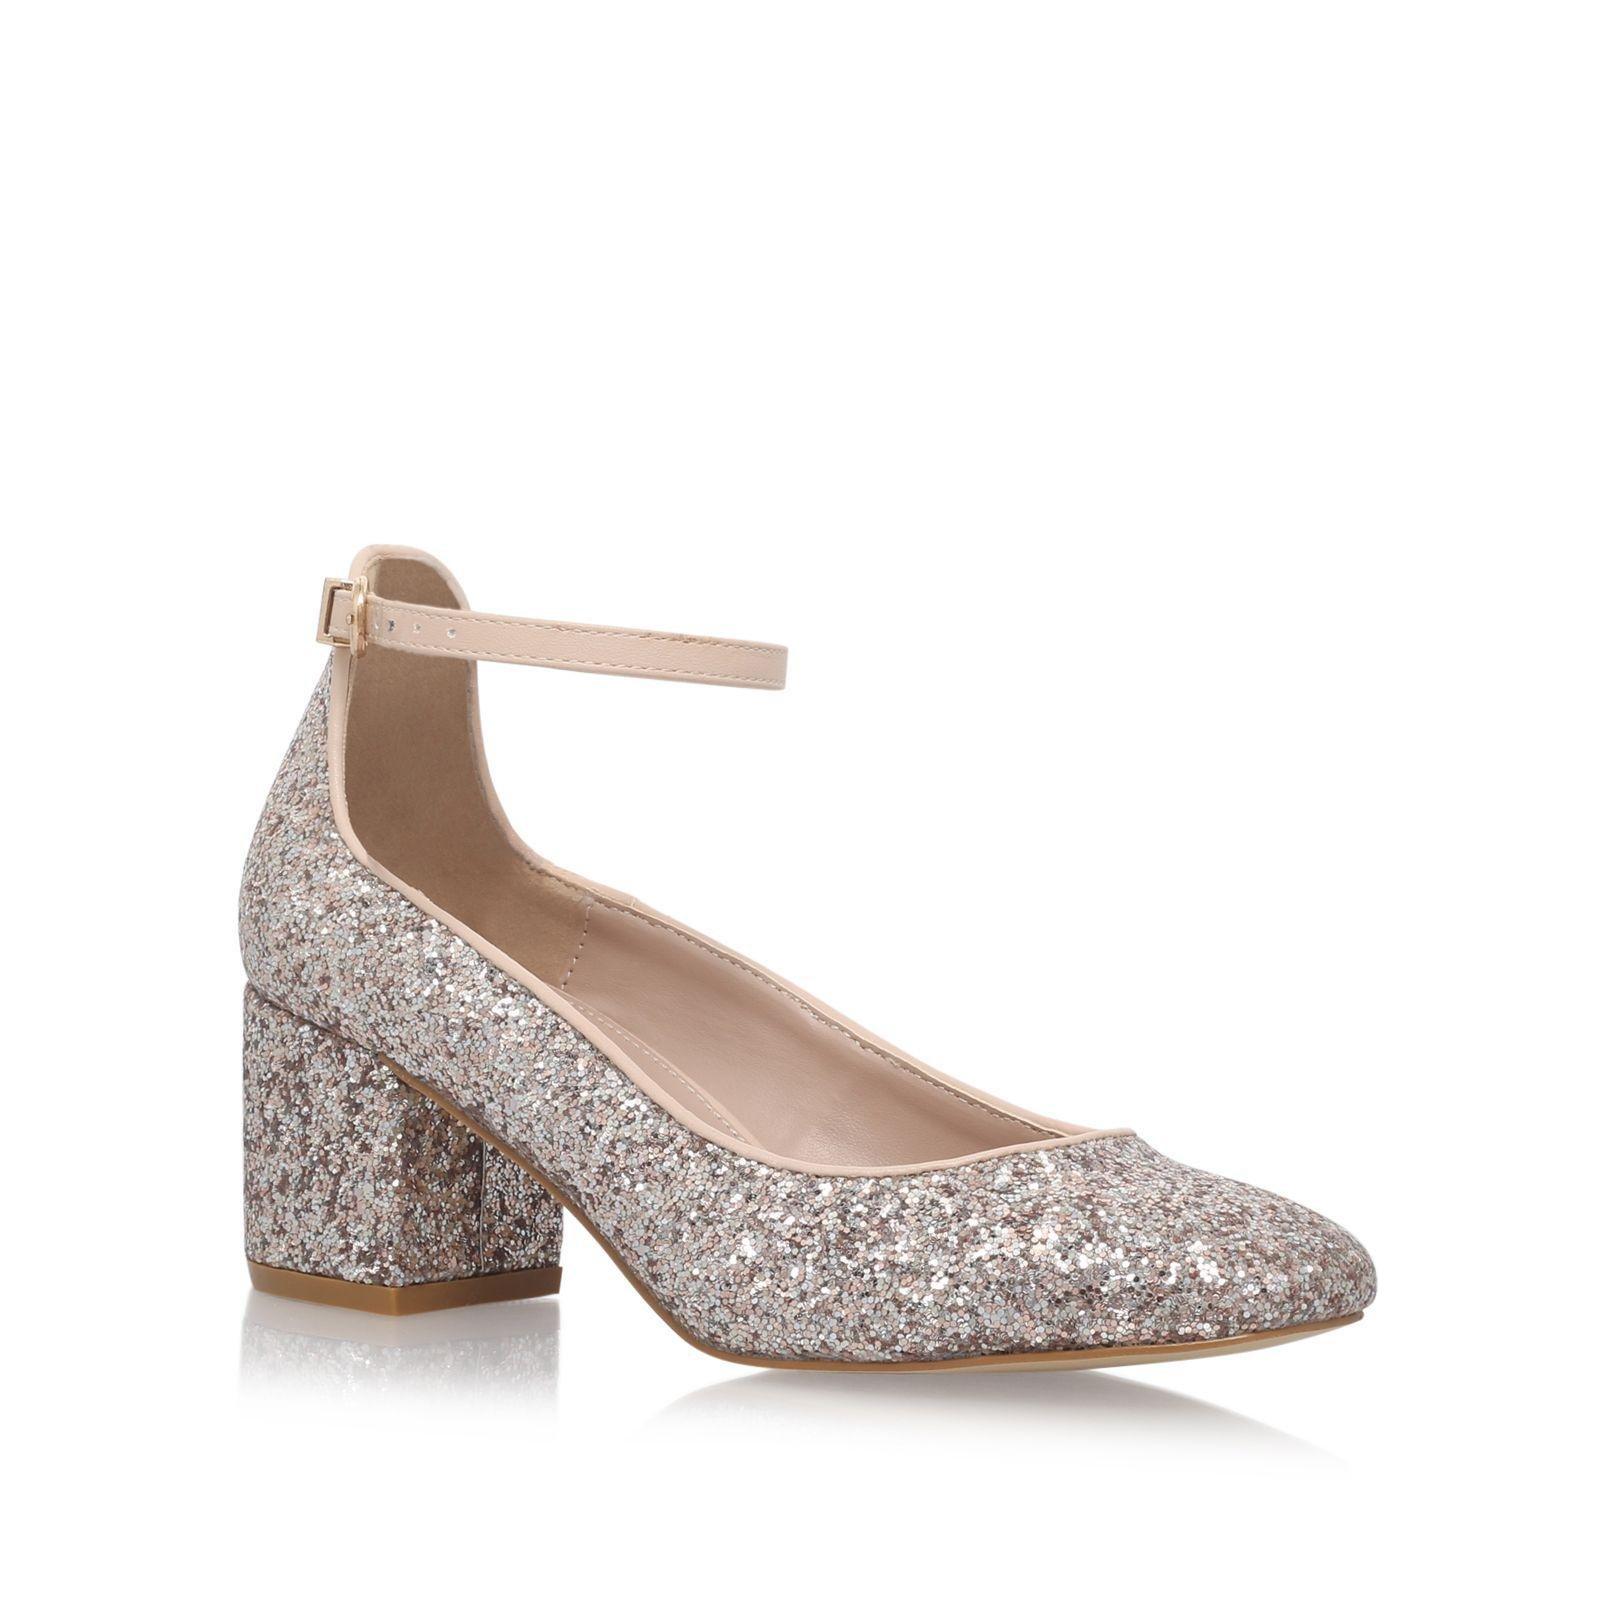 Radley Shoes Uk